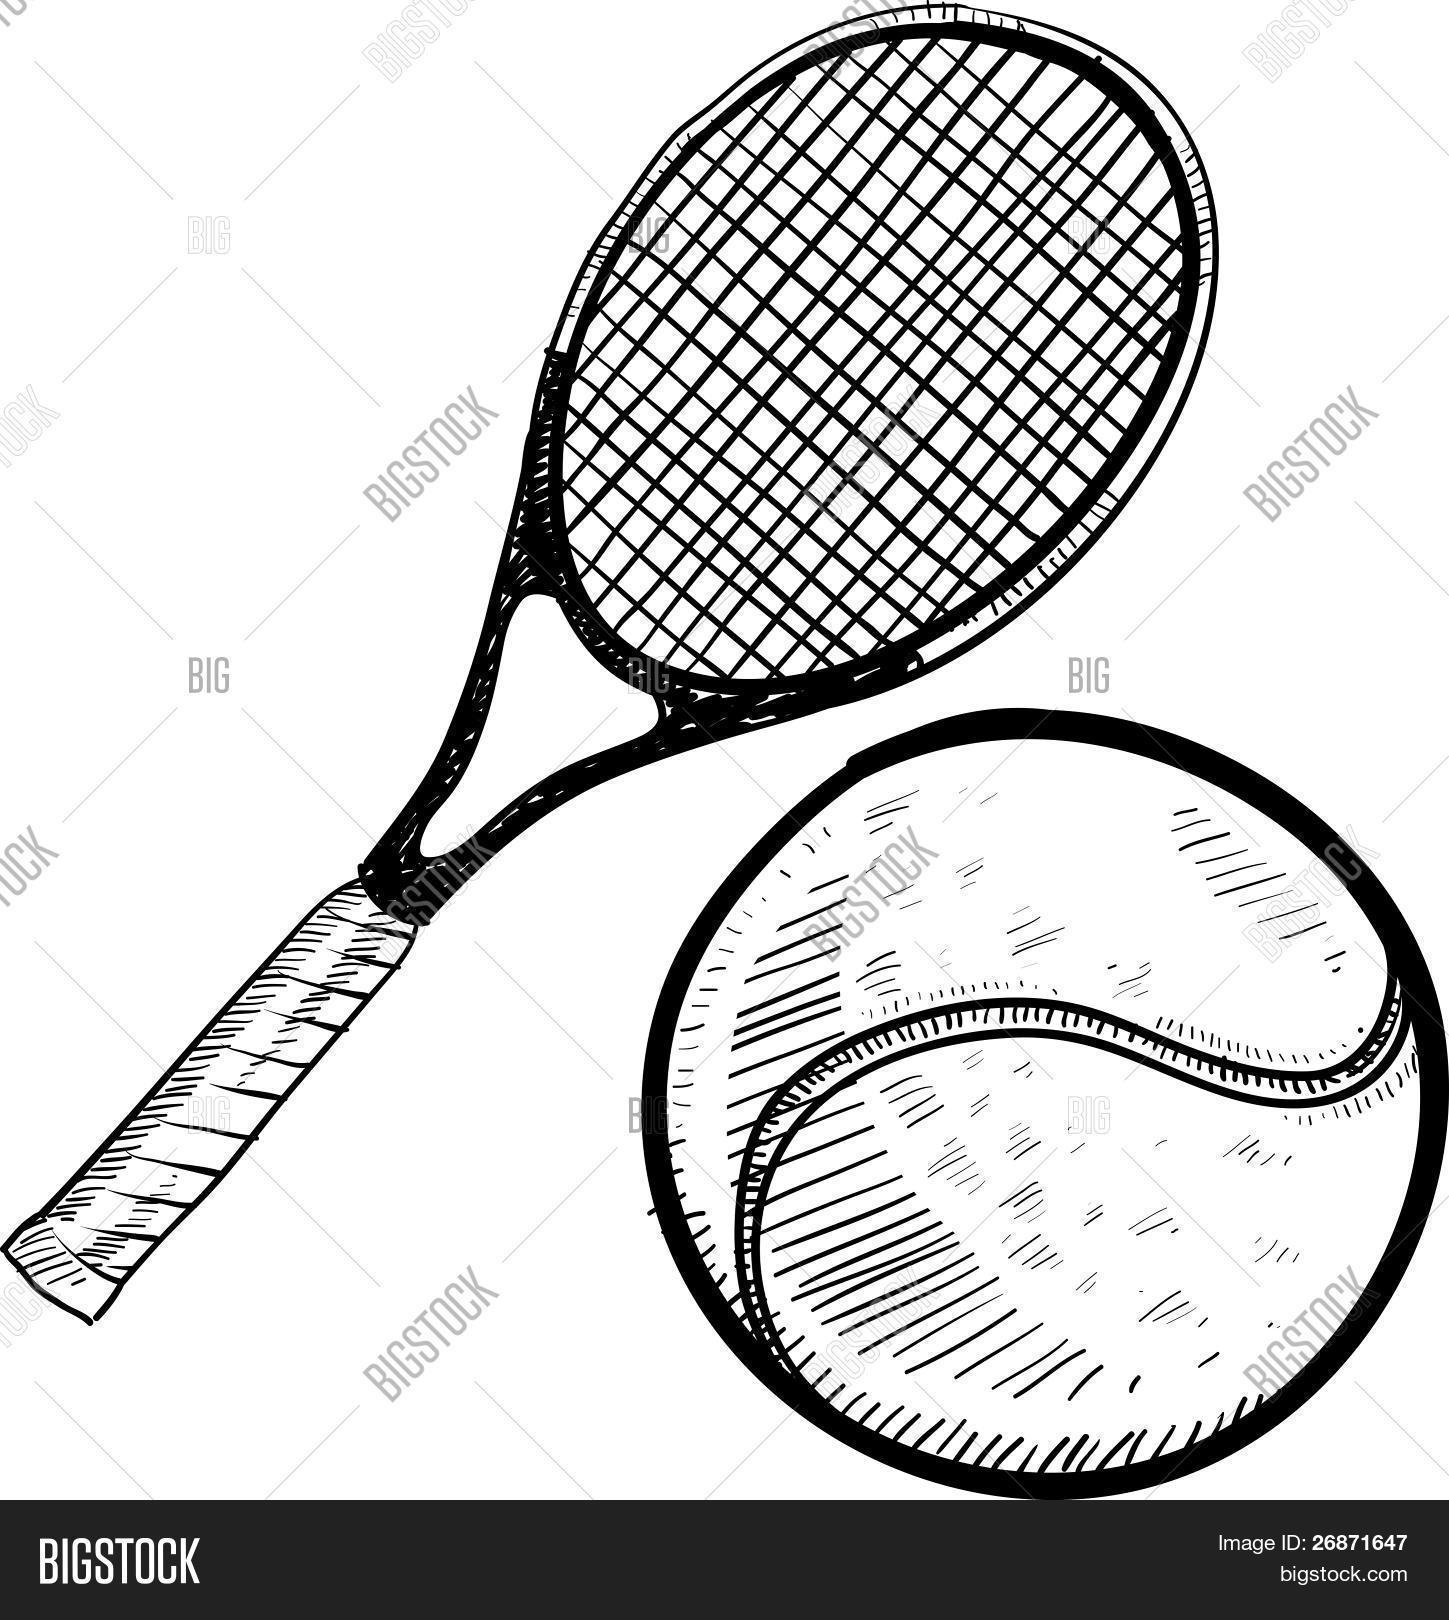 1449x1620 Tennis Ball Racket Sketch Vector Amp Photo Bigstock